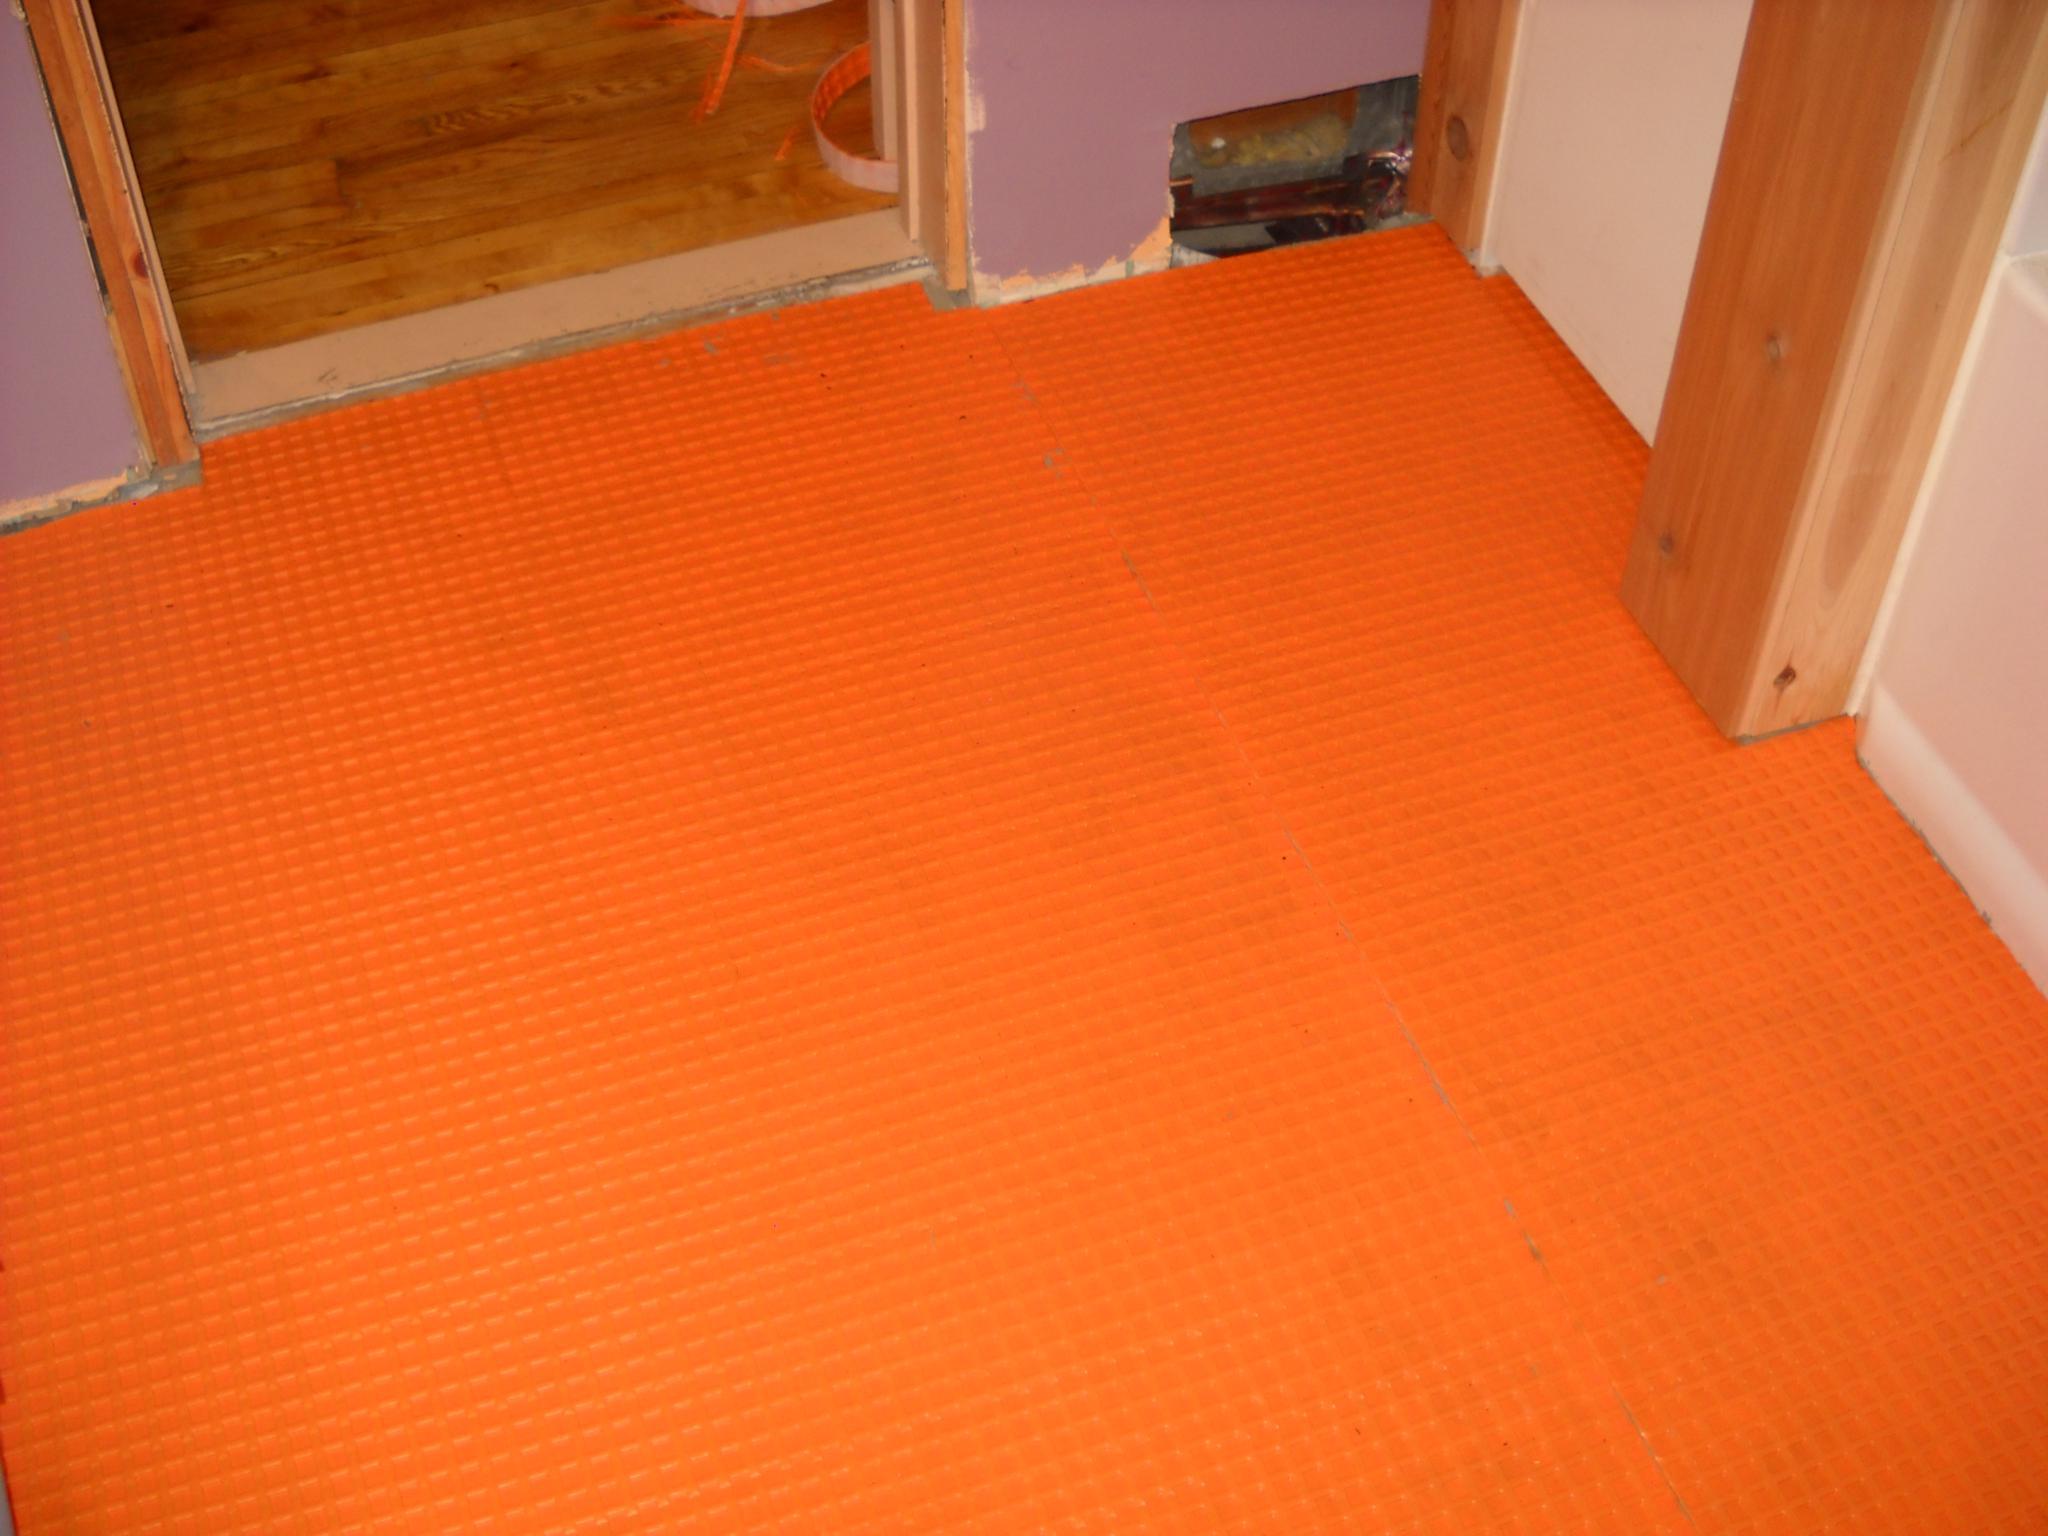 Bathroom Floor Underlayment For Tile : Bathroom remodel ? acrpc